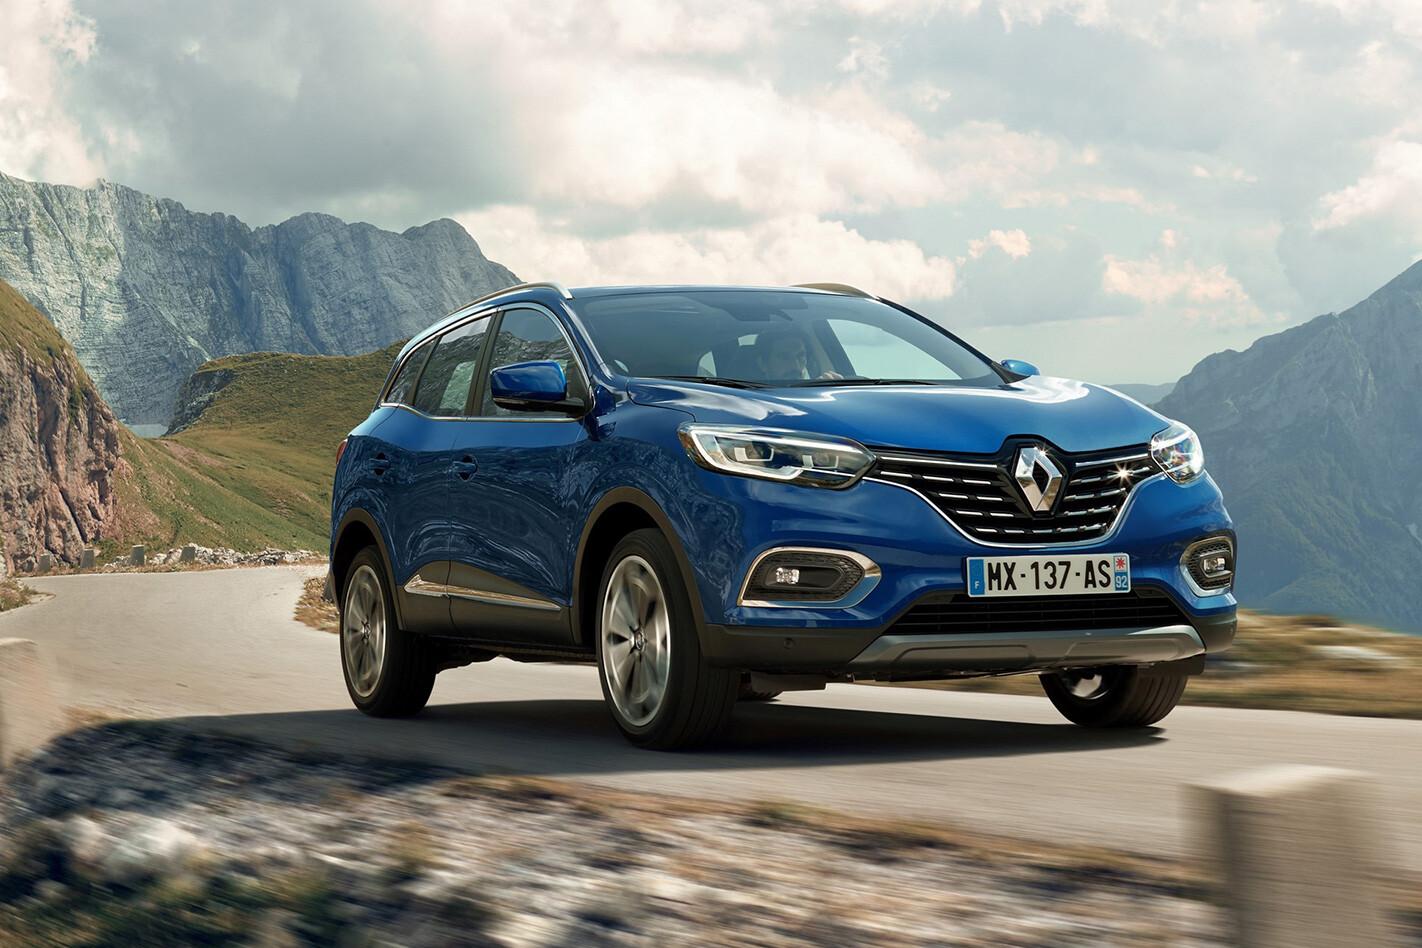 Renault Kadjar Nice Jpg